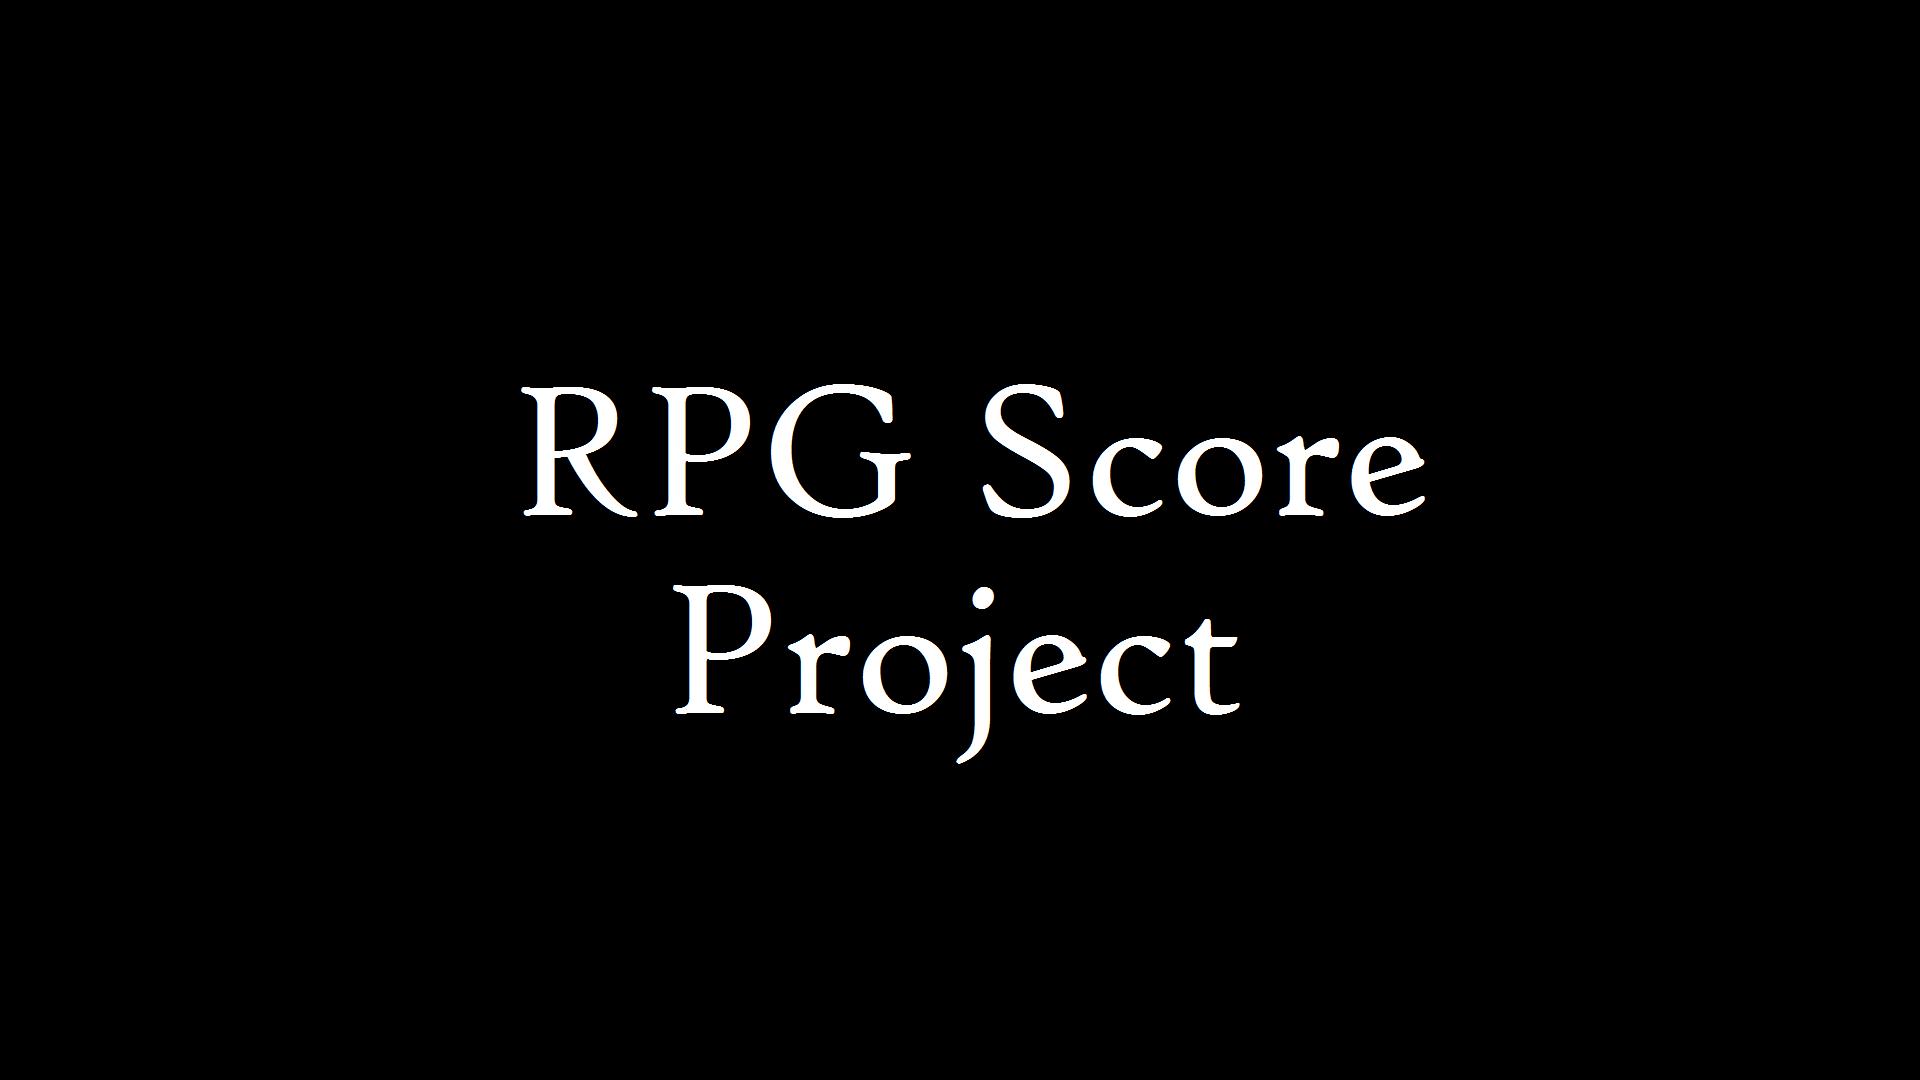 RPG Portfolio Project